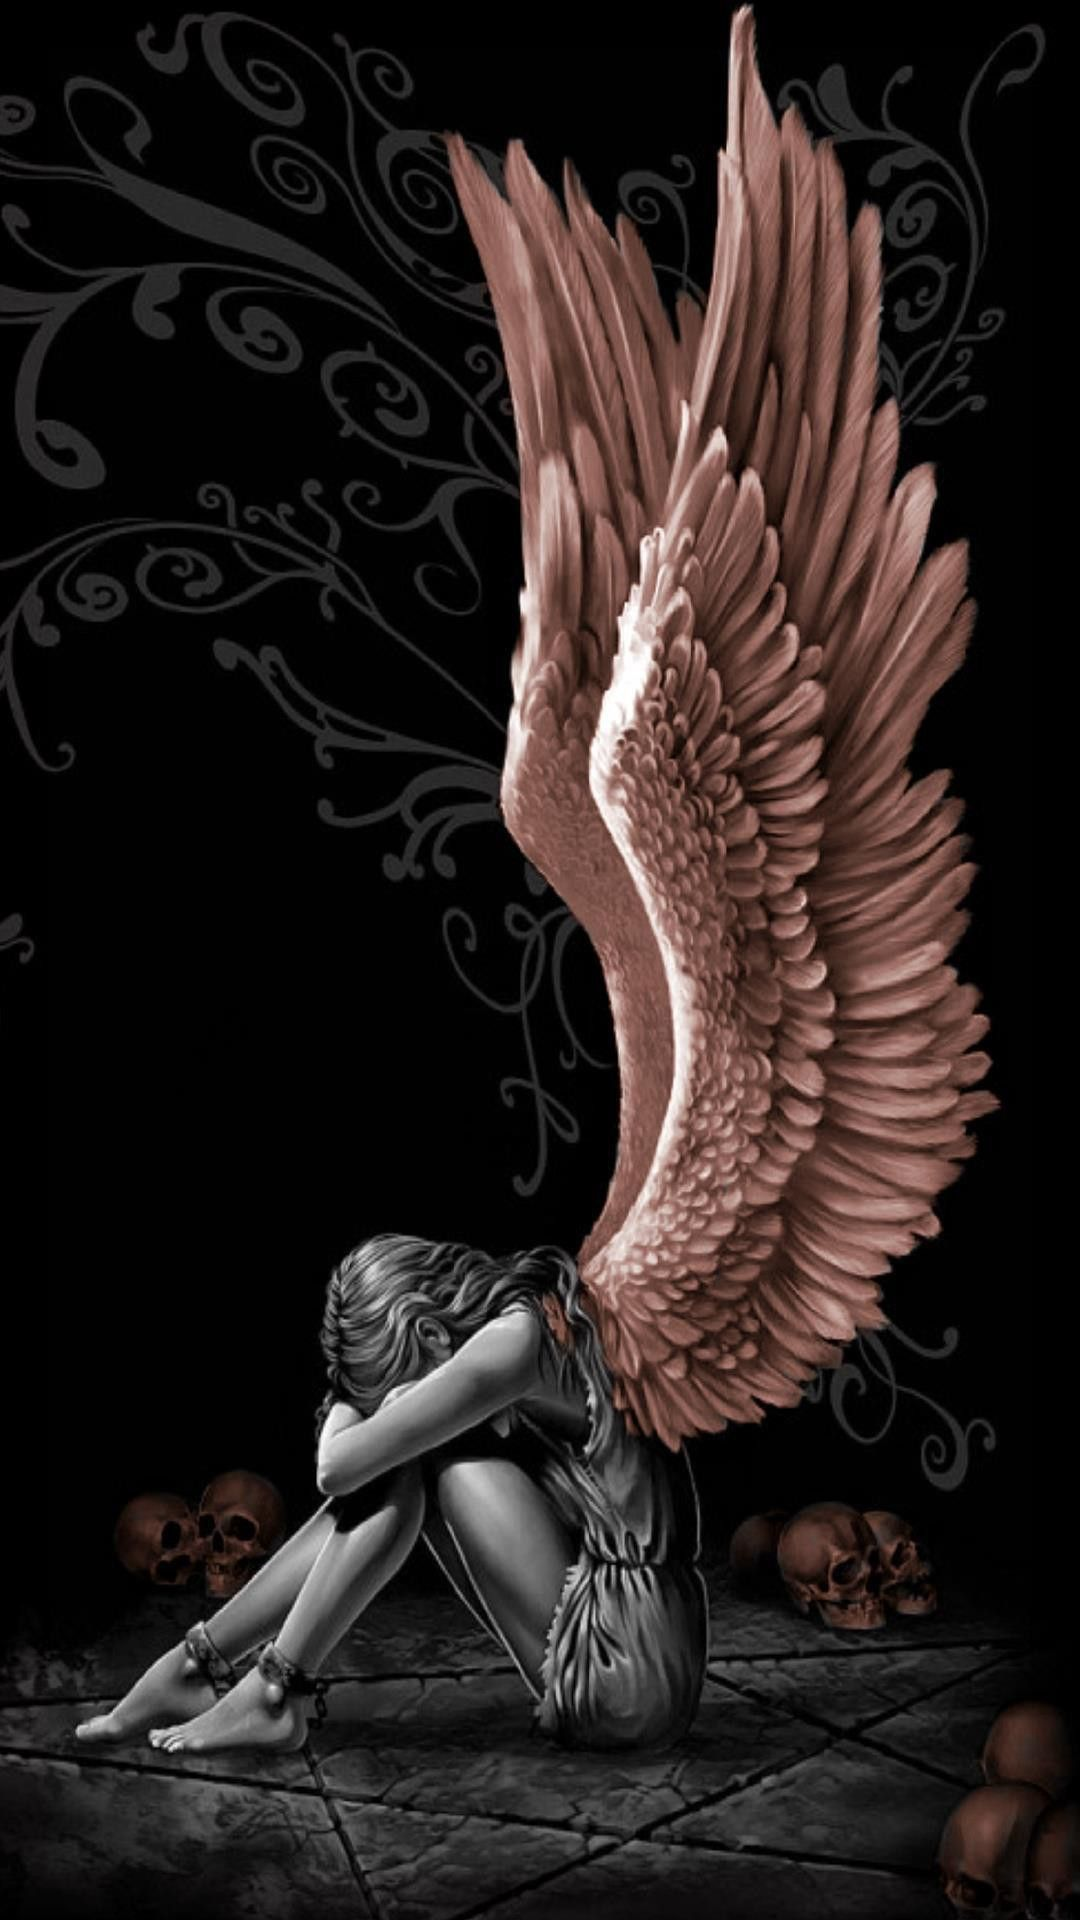 Angel Girl And Skulls Wallpaper Pin By K Morgart On Art Art Angel Angel Wings